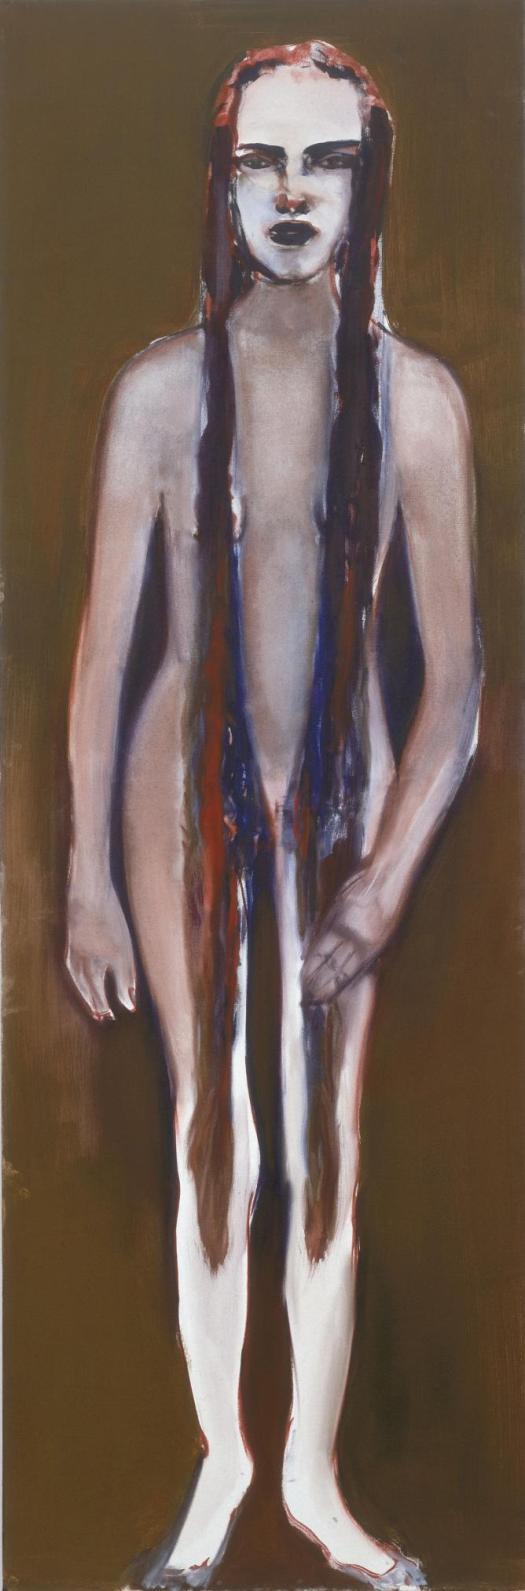 (c) Marlene Dumas - Mgdalena Newman